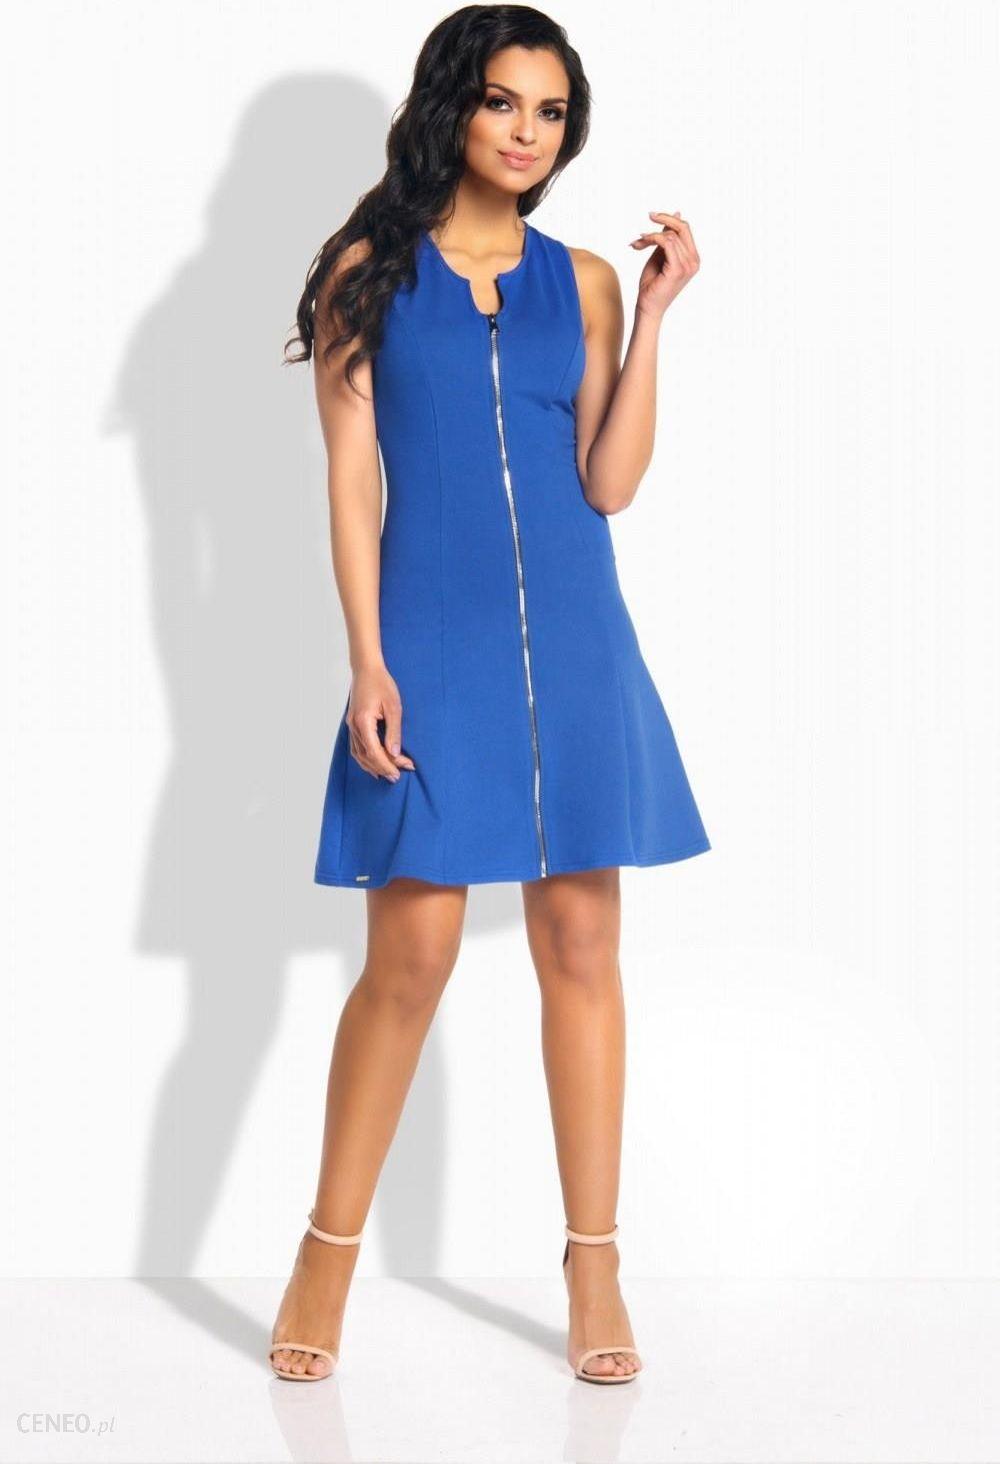 d08a03bee7 Sukienka Model L183 Chaber - Ceny i opinie - Ceneo.pl